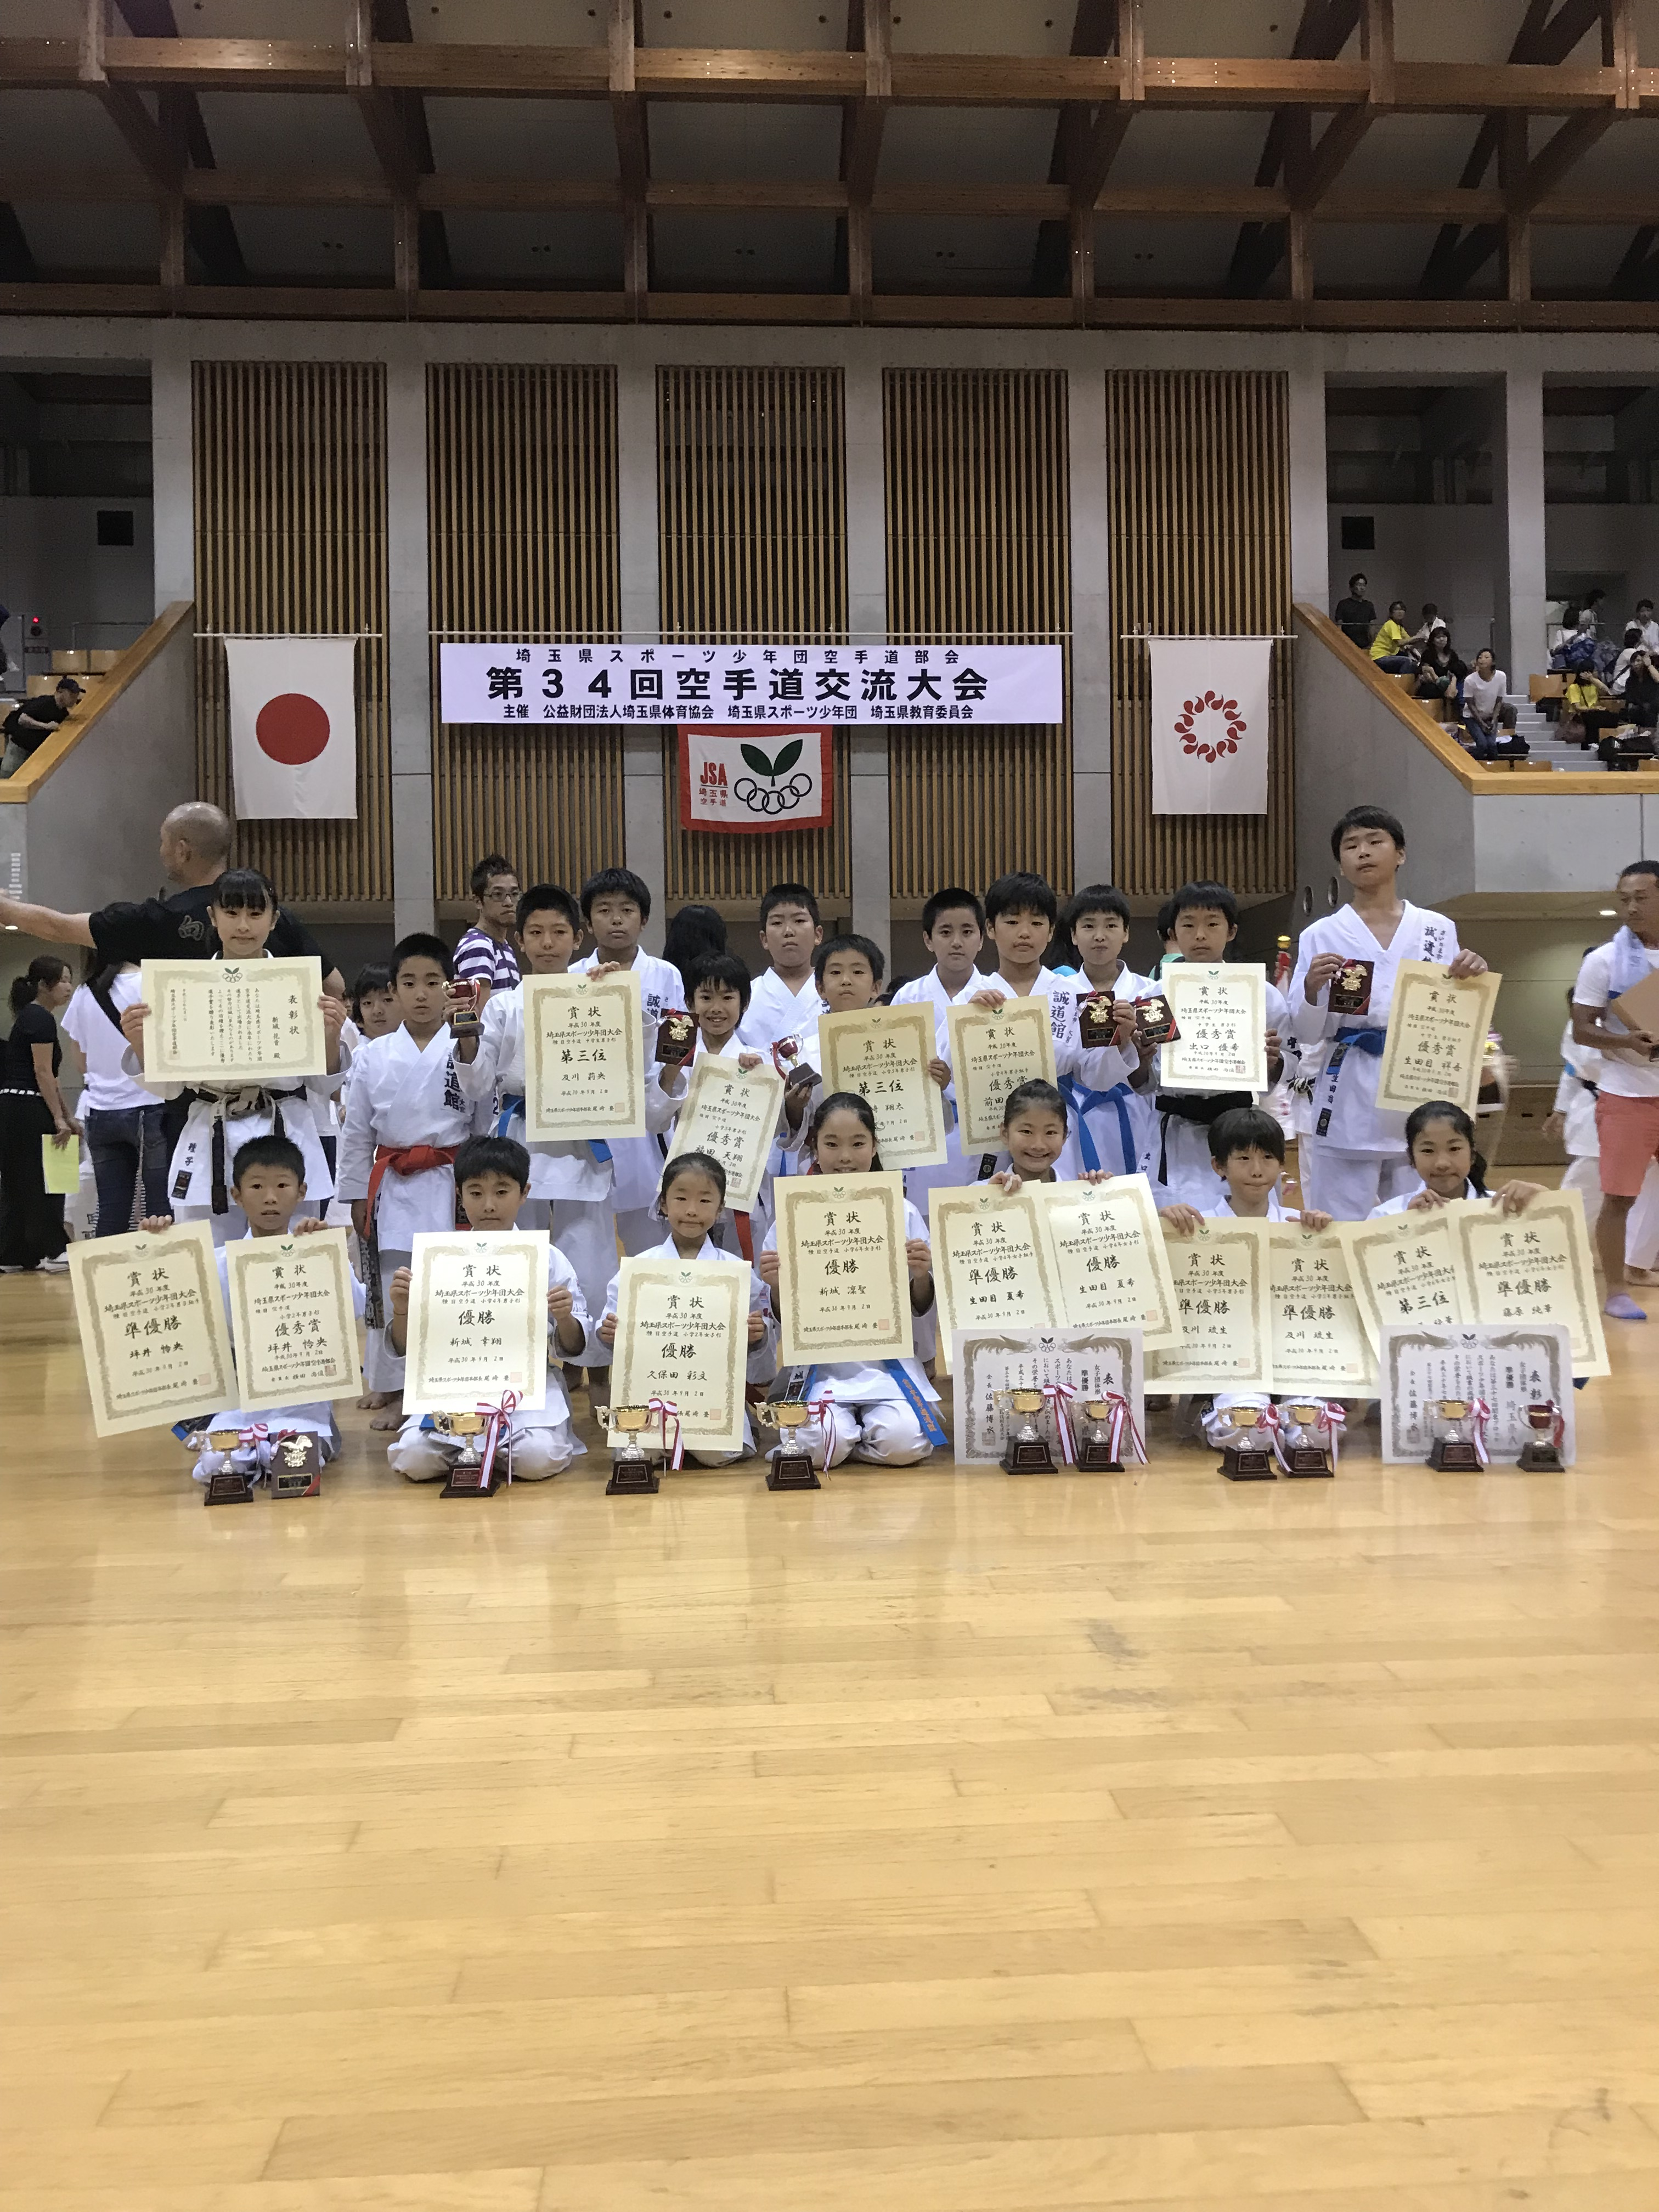 第34回 埼玉県スポーツ少年団空手道交流大会